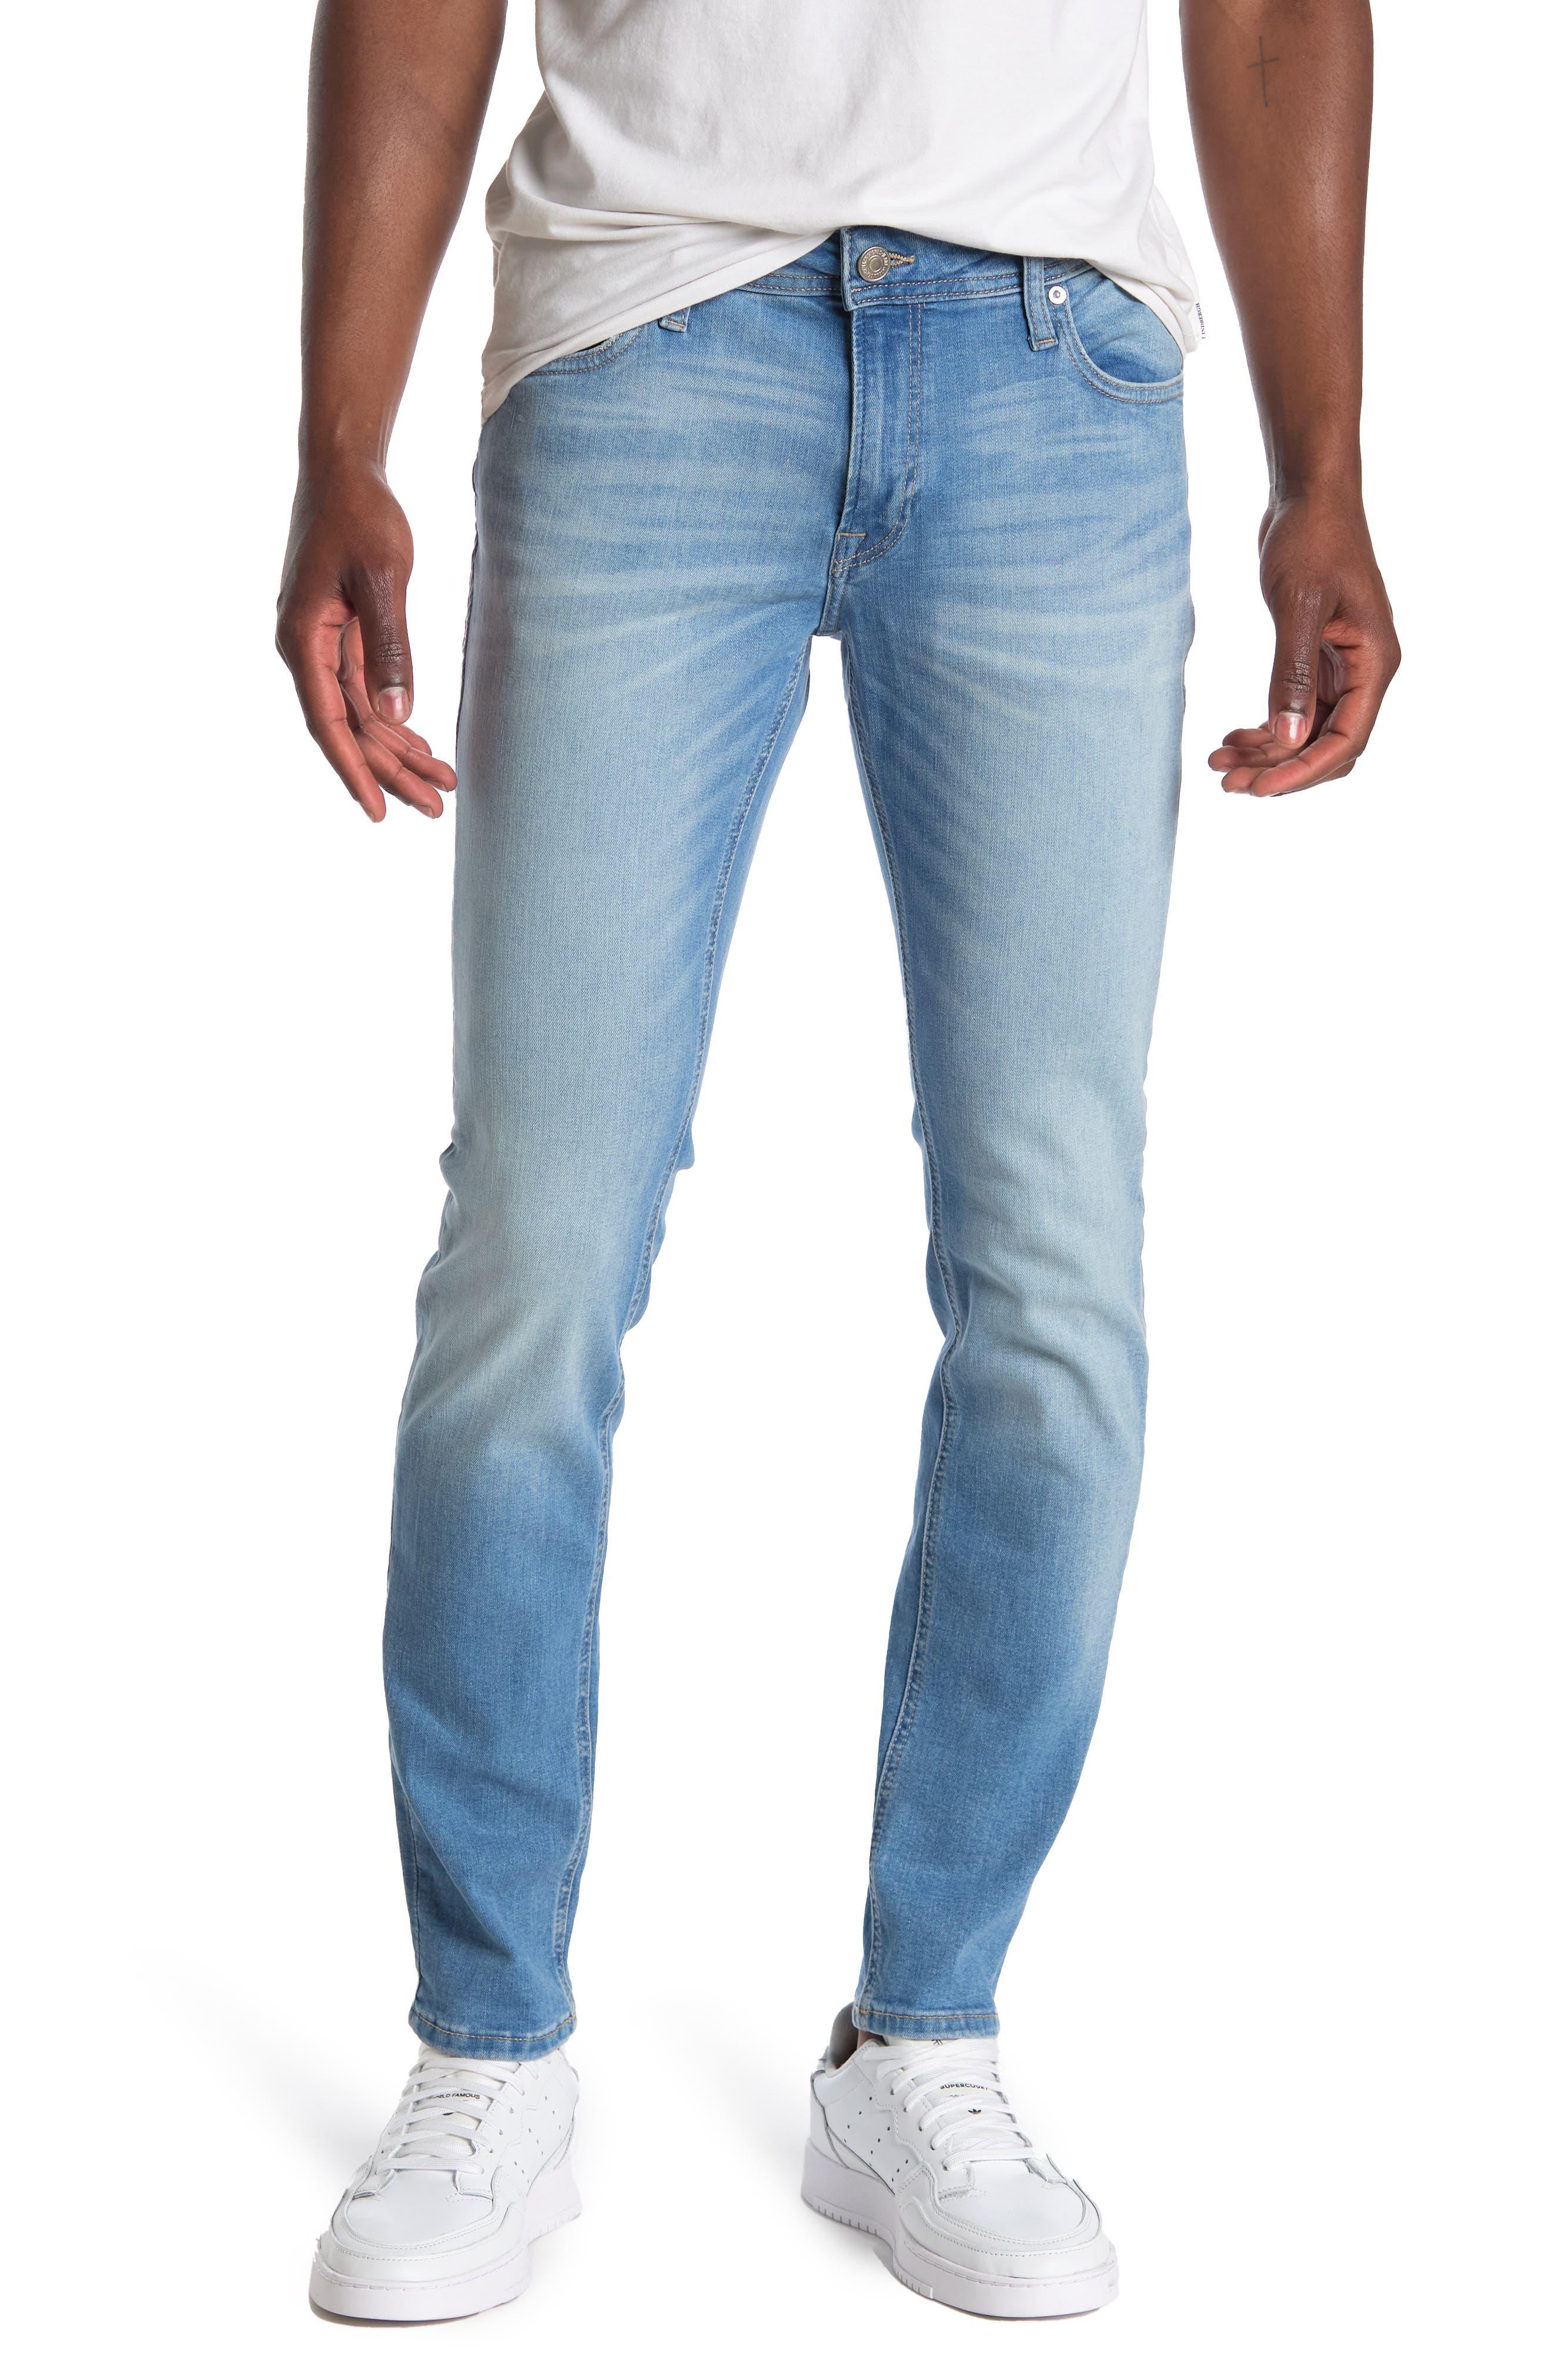 Image of JACK & JONES Liam Original Skinny Jeans